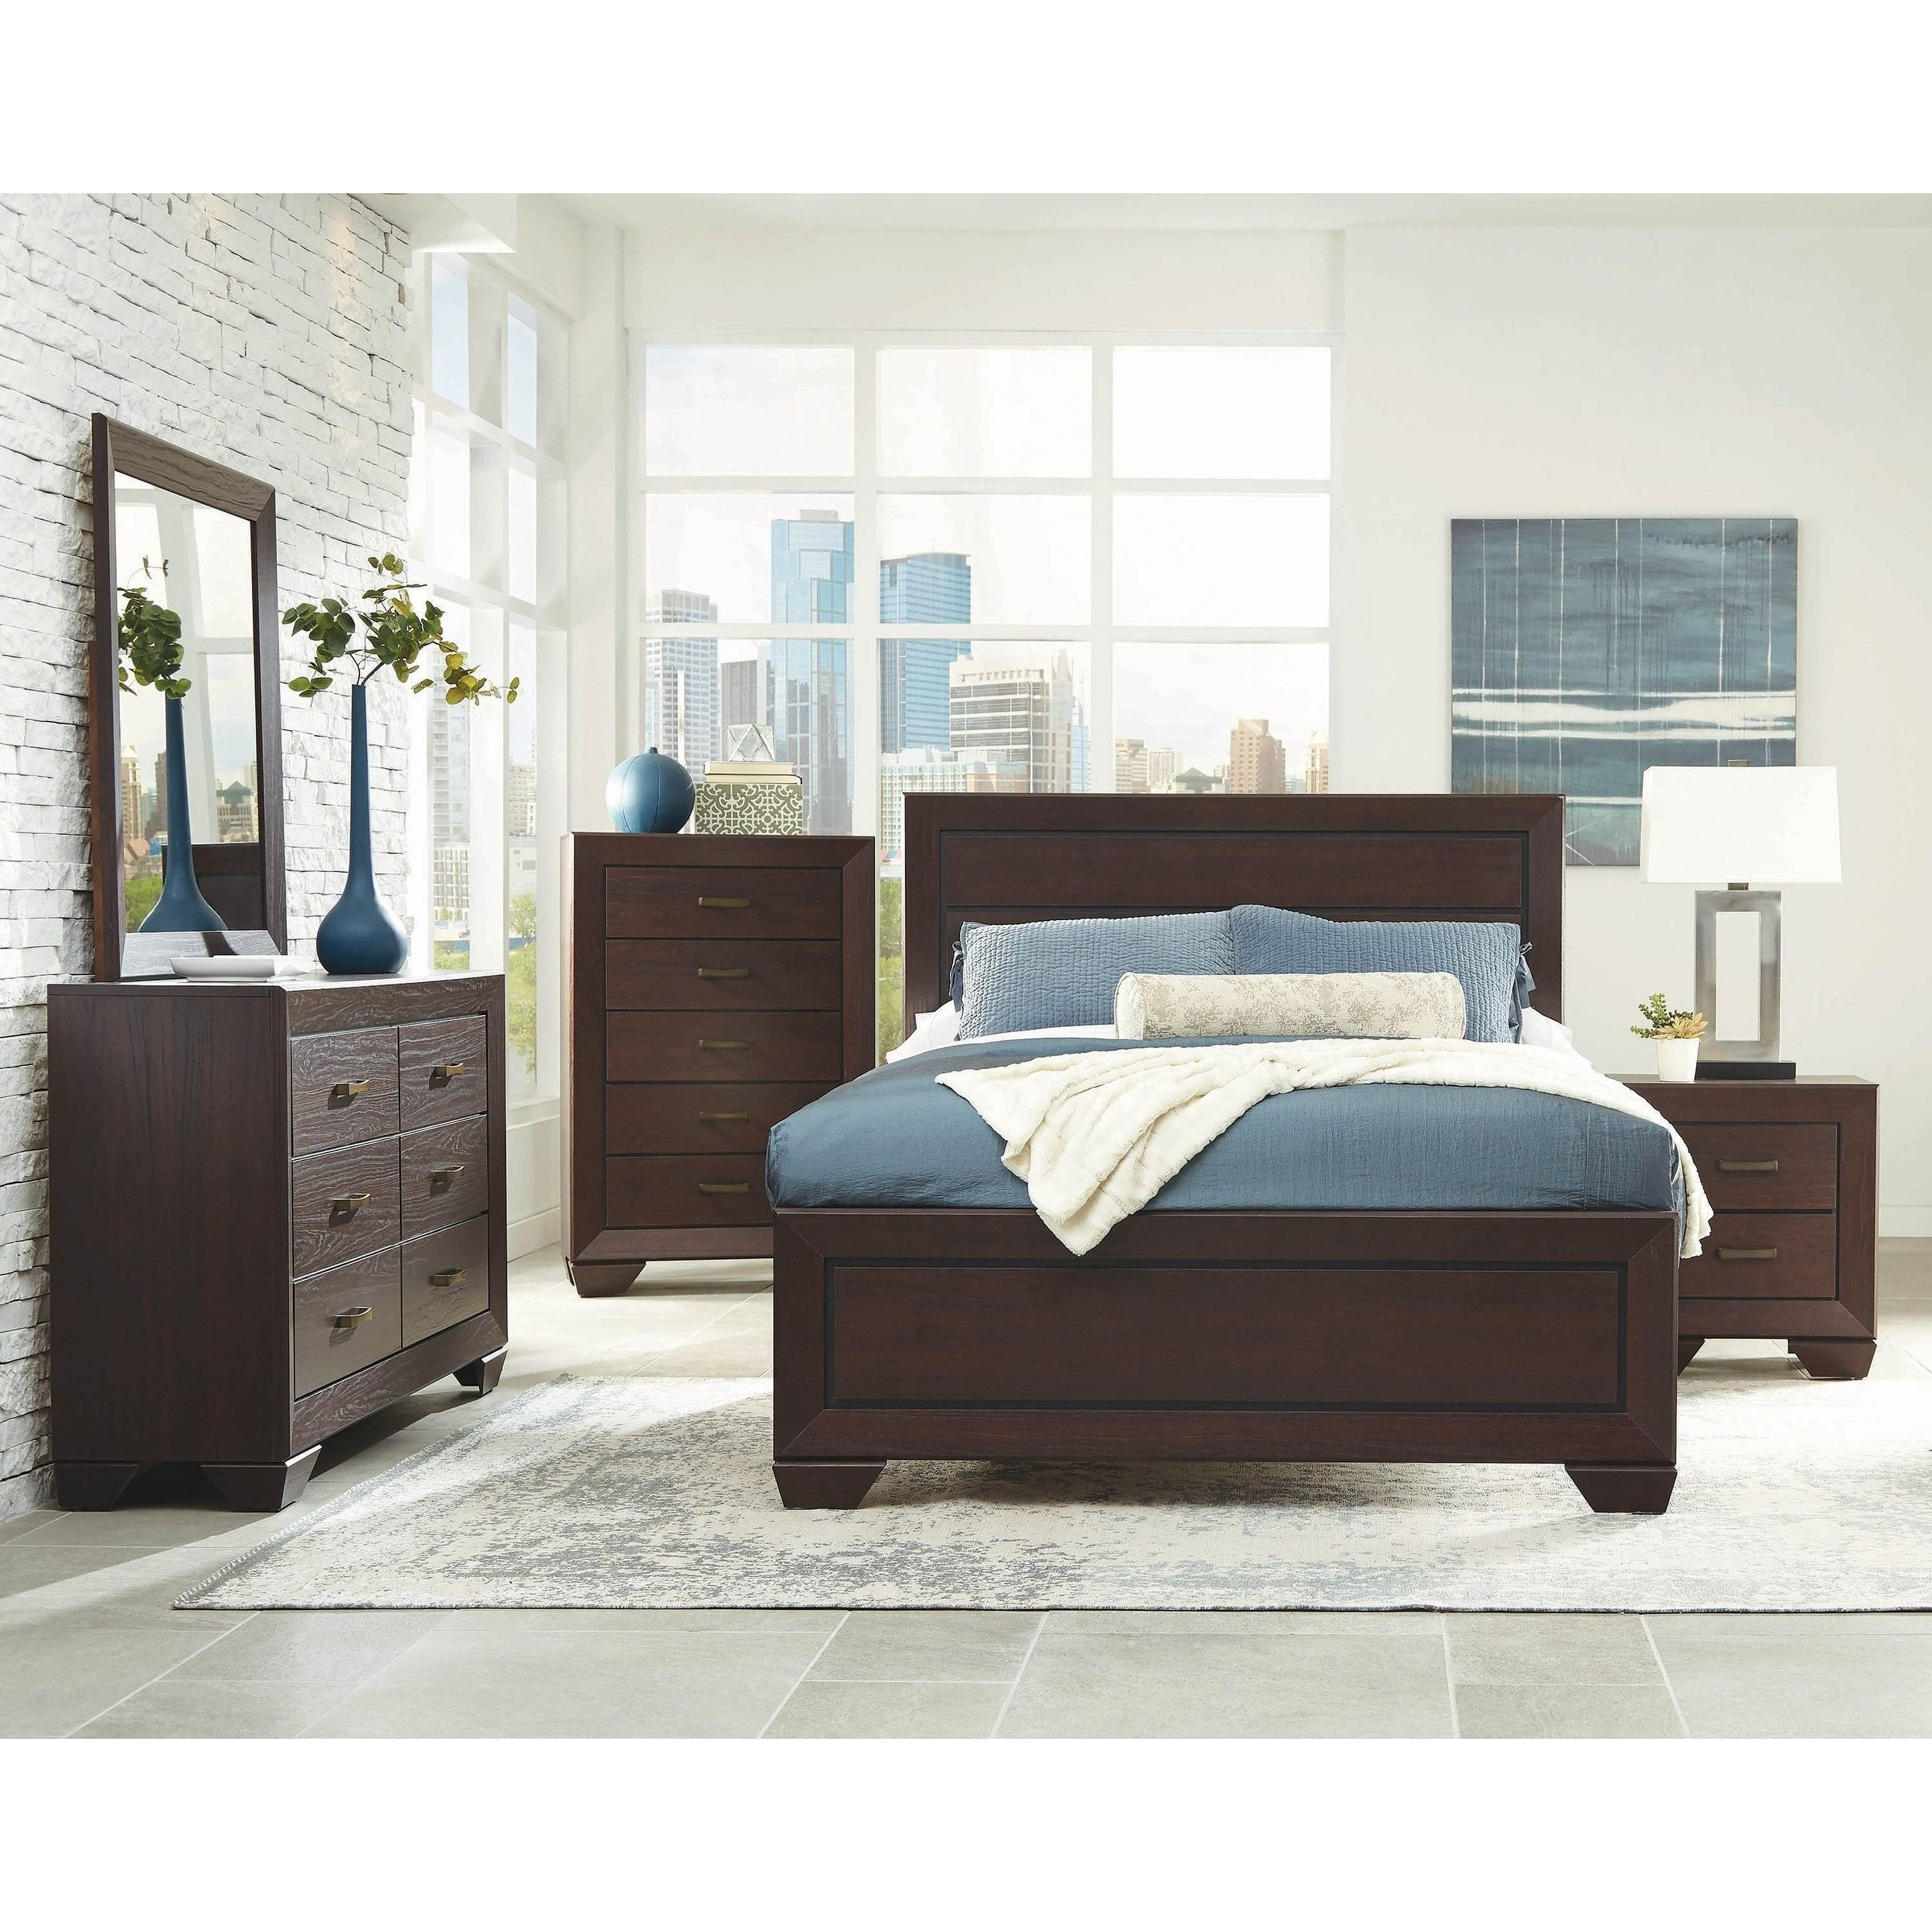 Ridgeview Dark Cocoa 5piece Panel Bedroom Set with 2